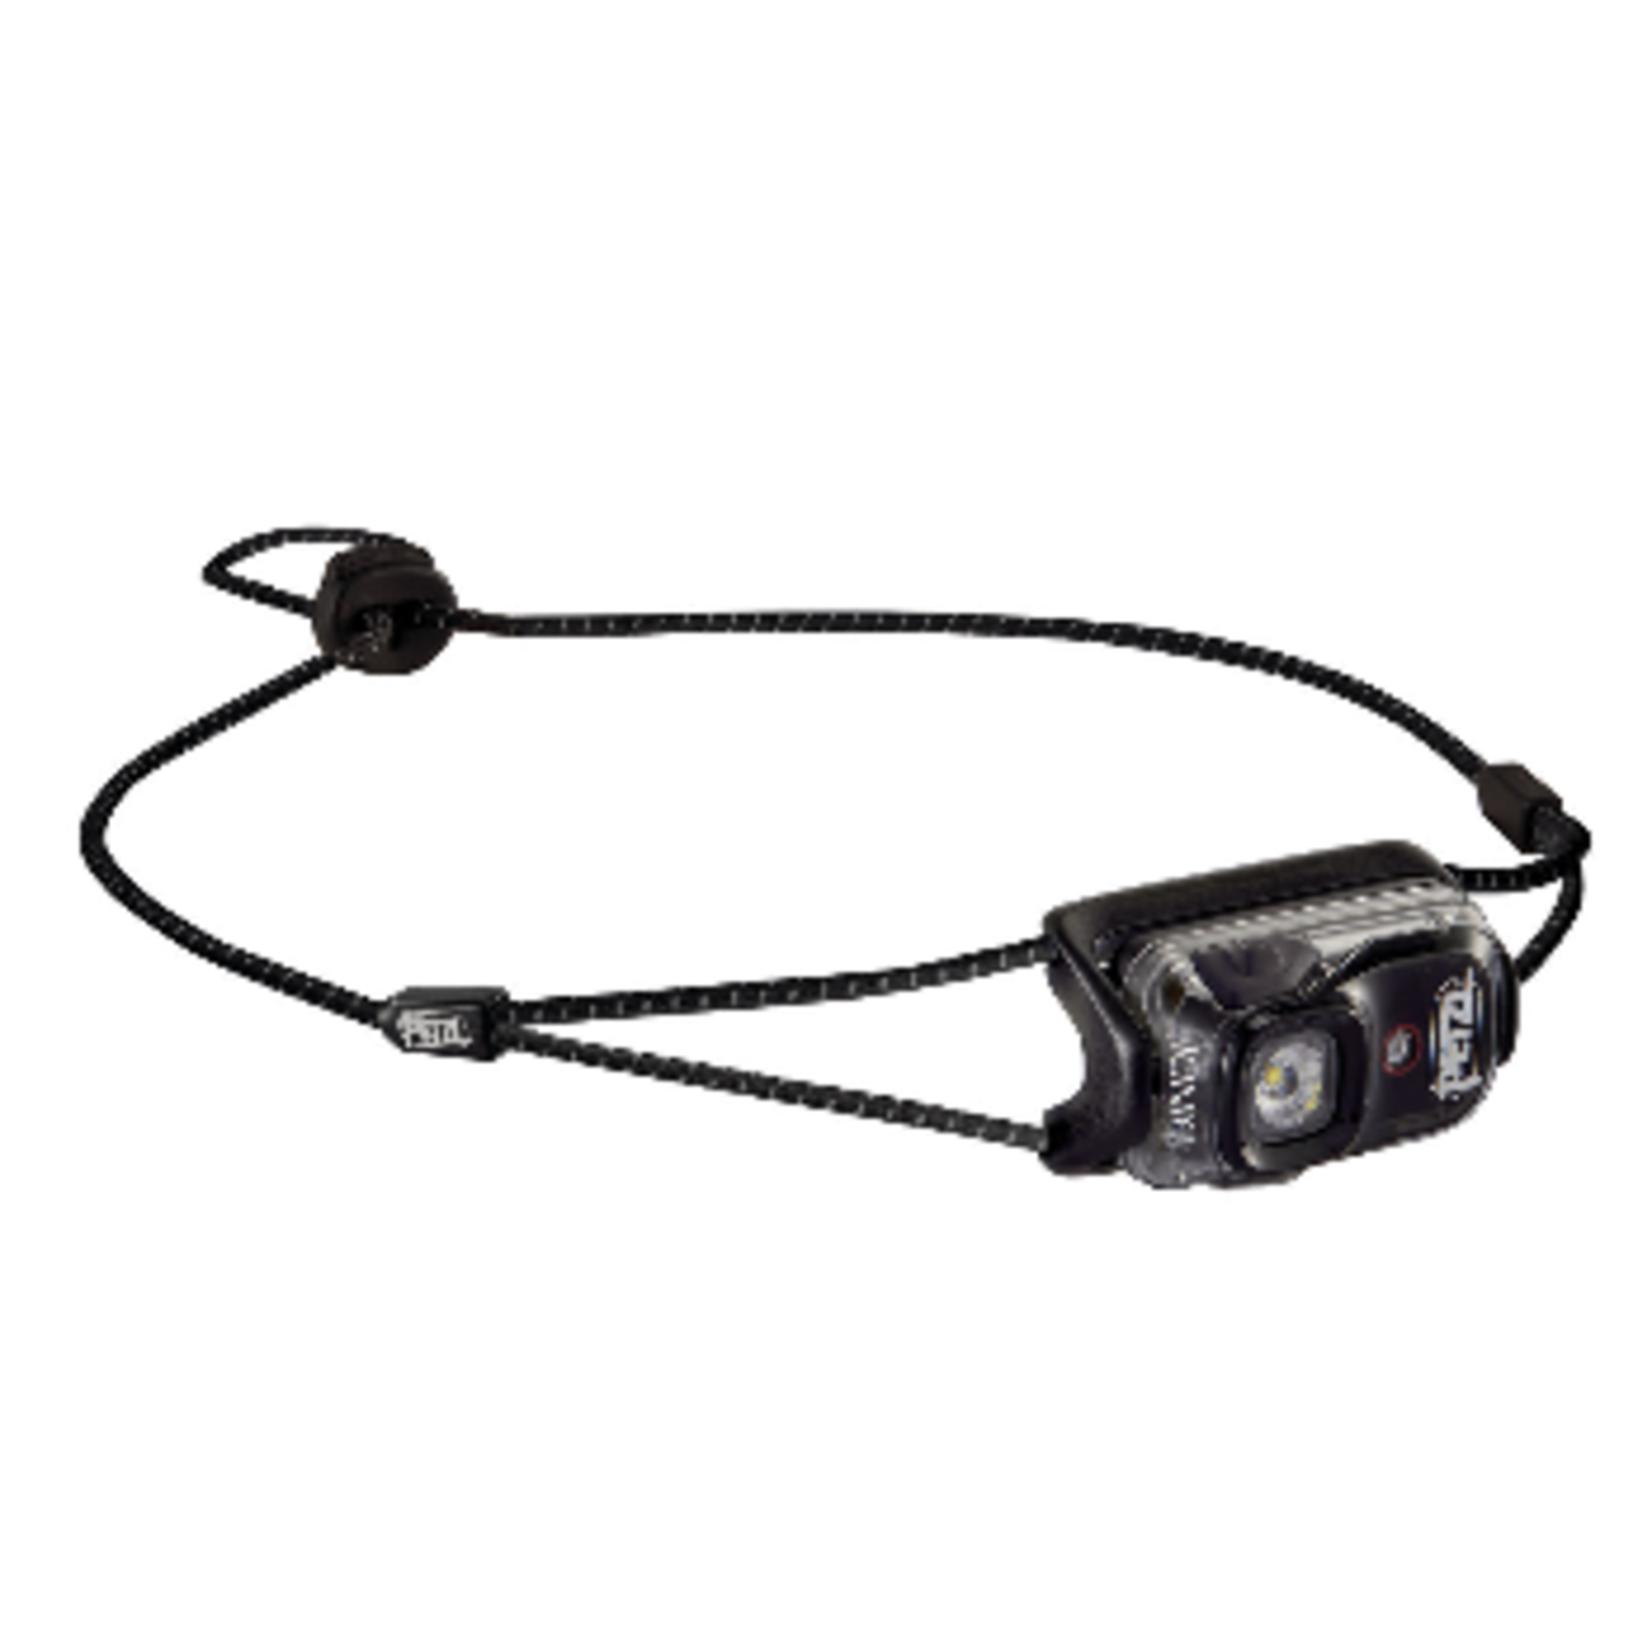 Petzl BINDI® Headlamp